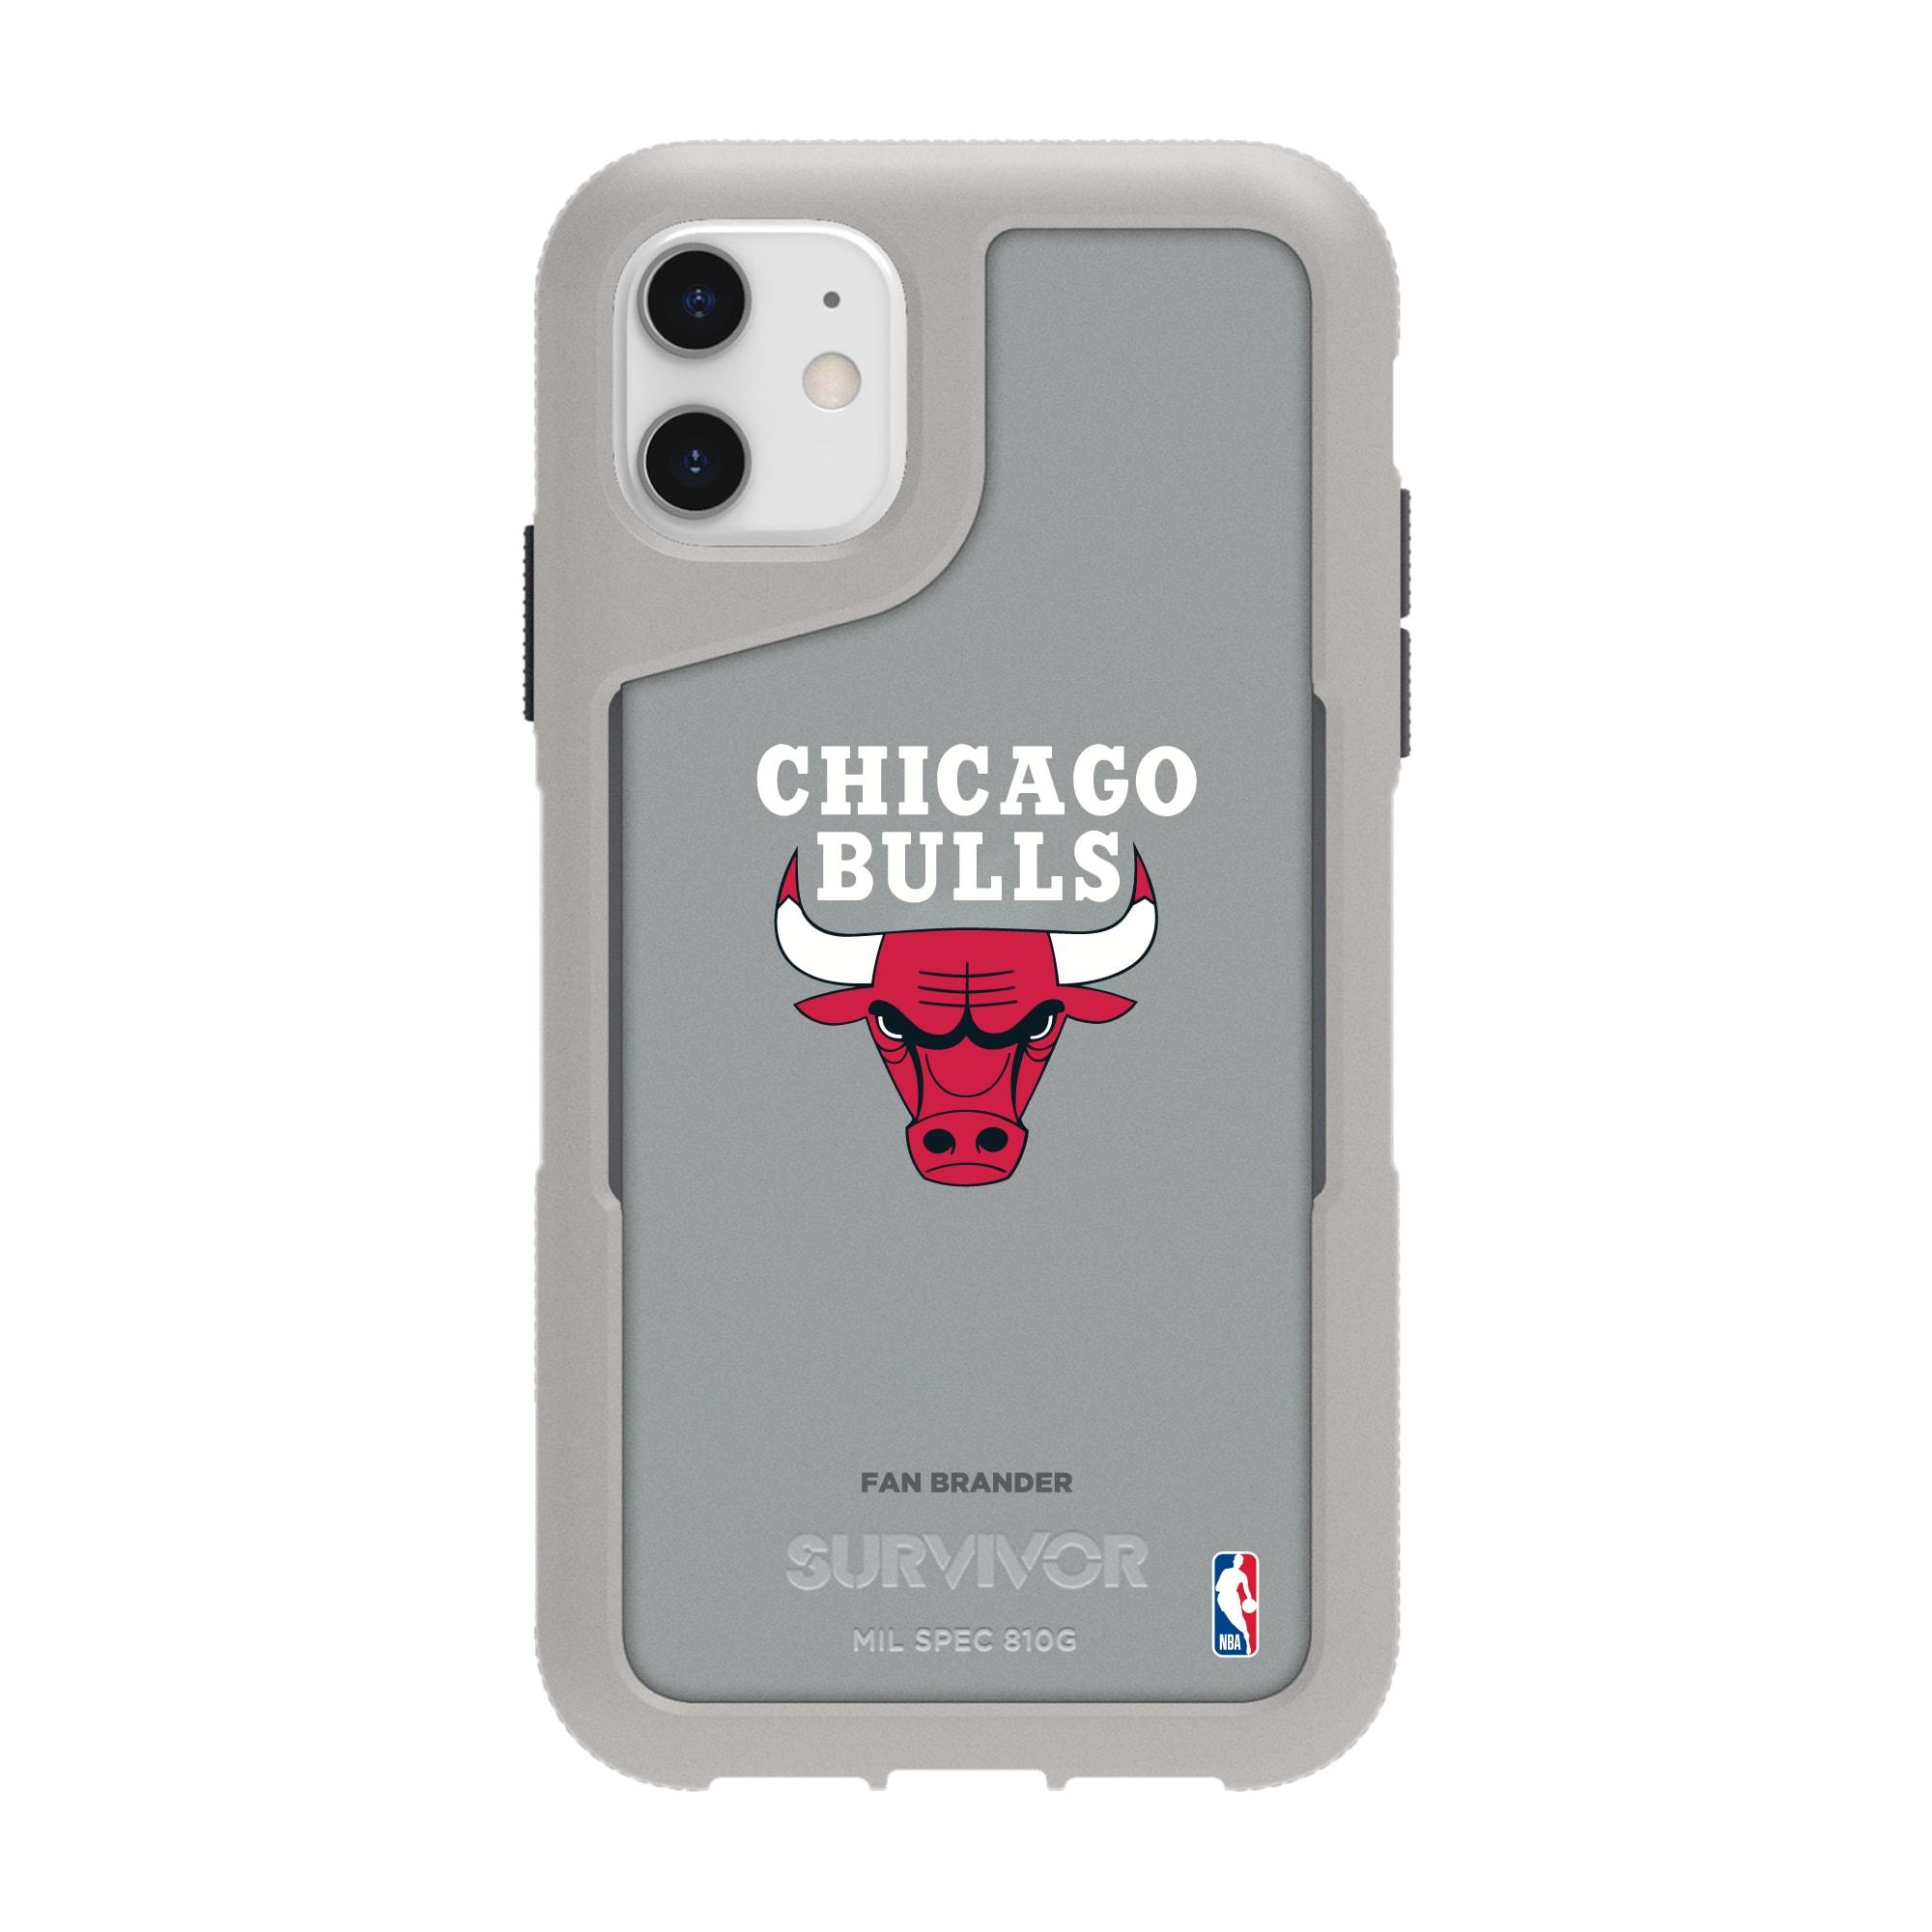 Chicago Bulls Griffin Survivor Endurance iPhone Case - Gray